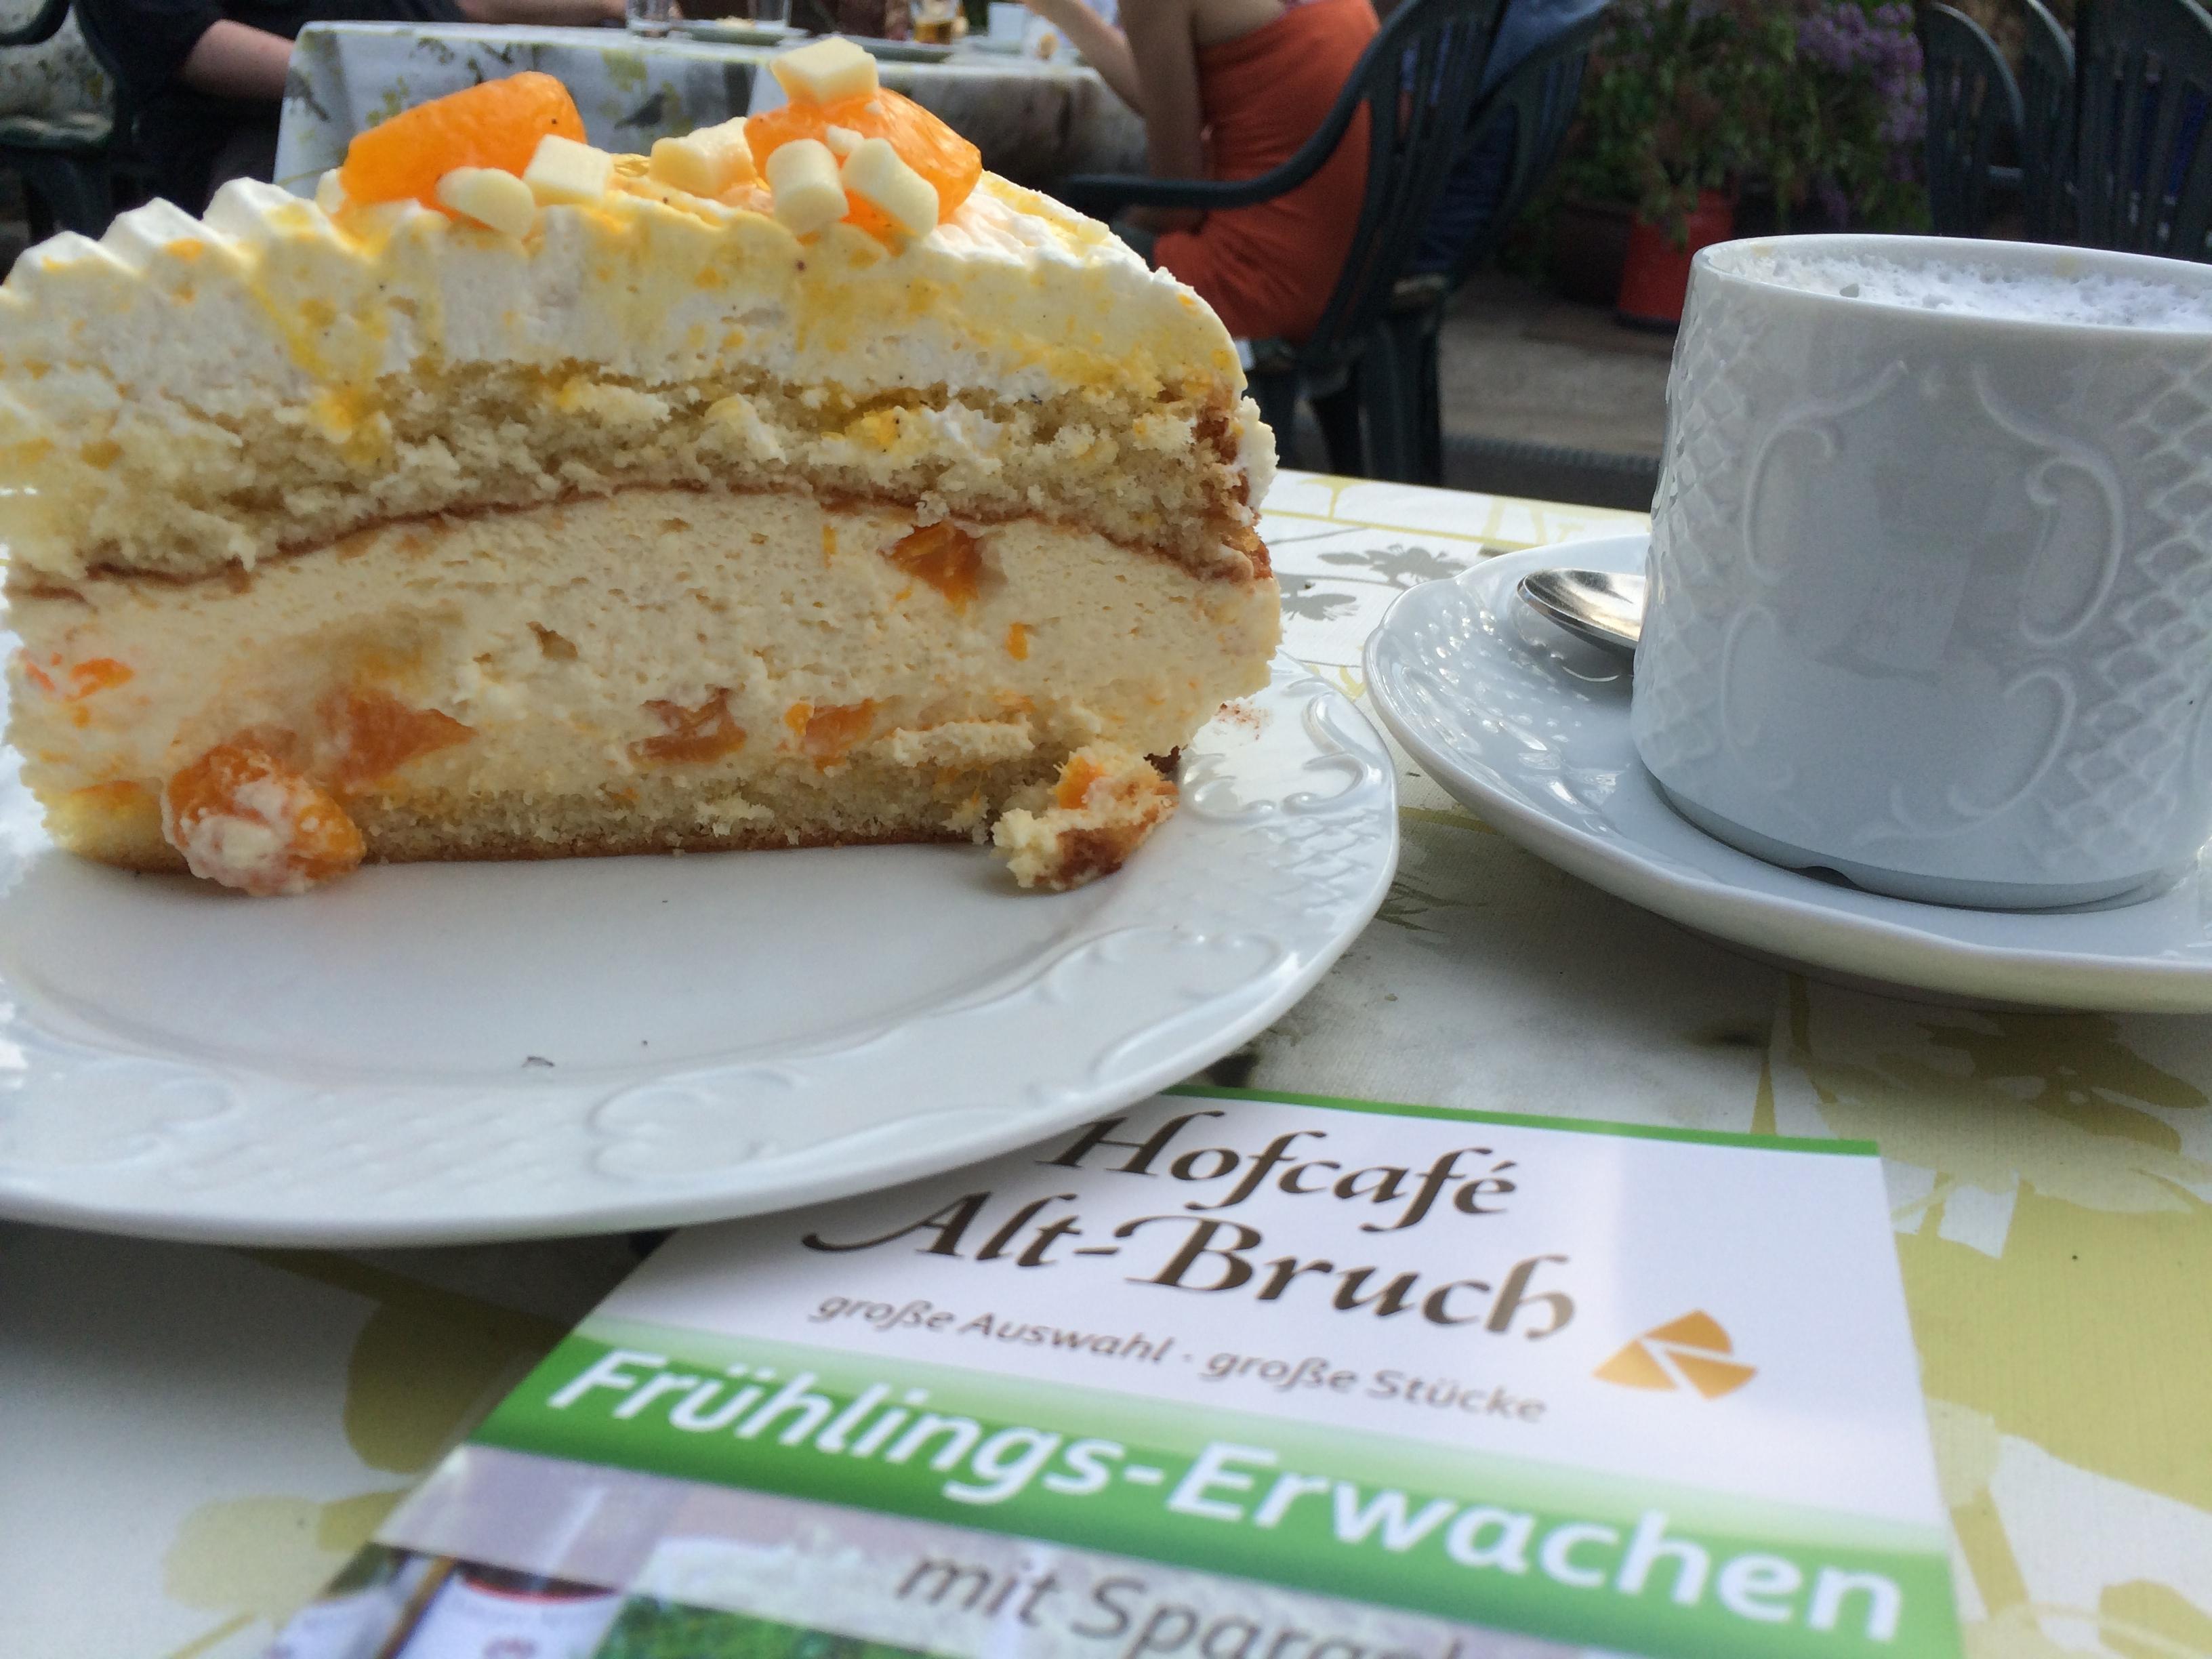 altbruchcafe Bauernhofcafé